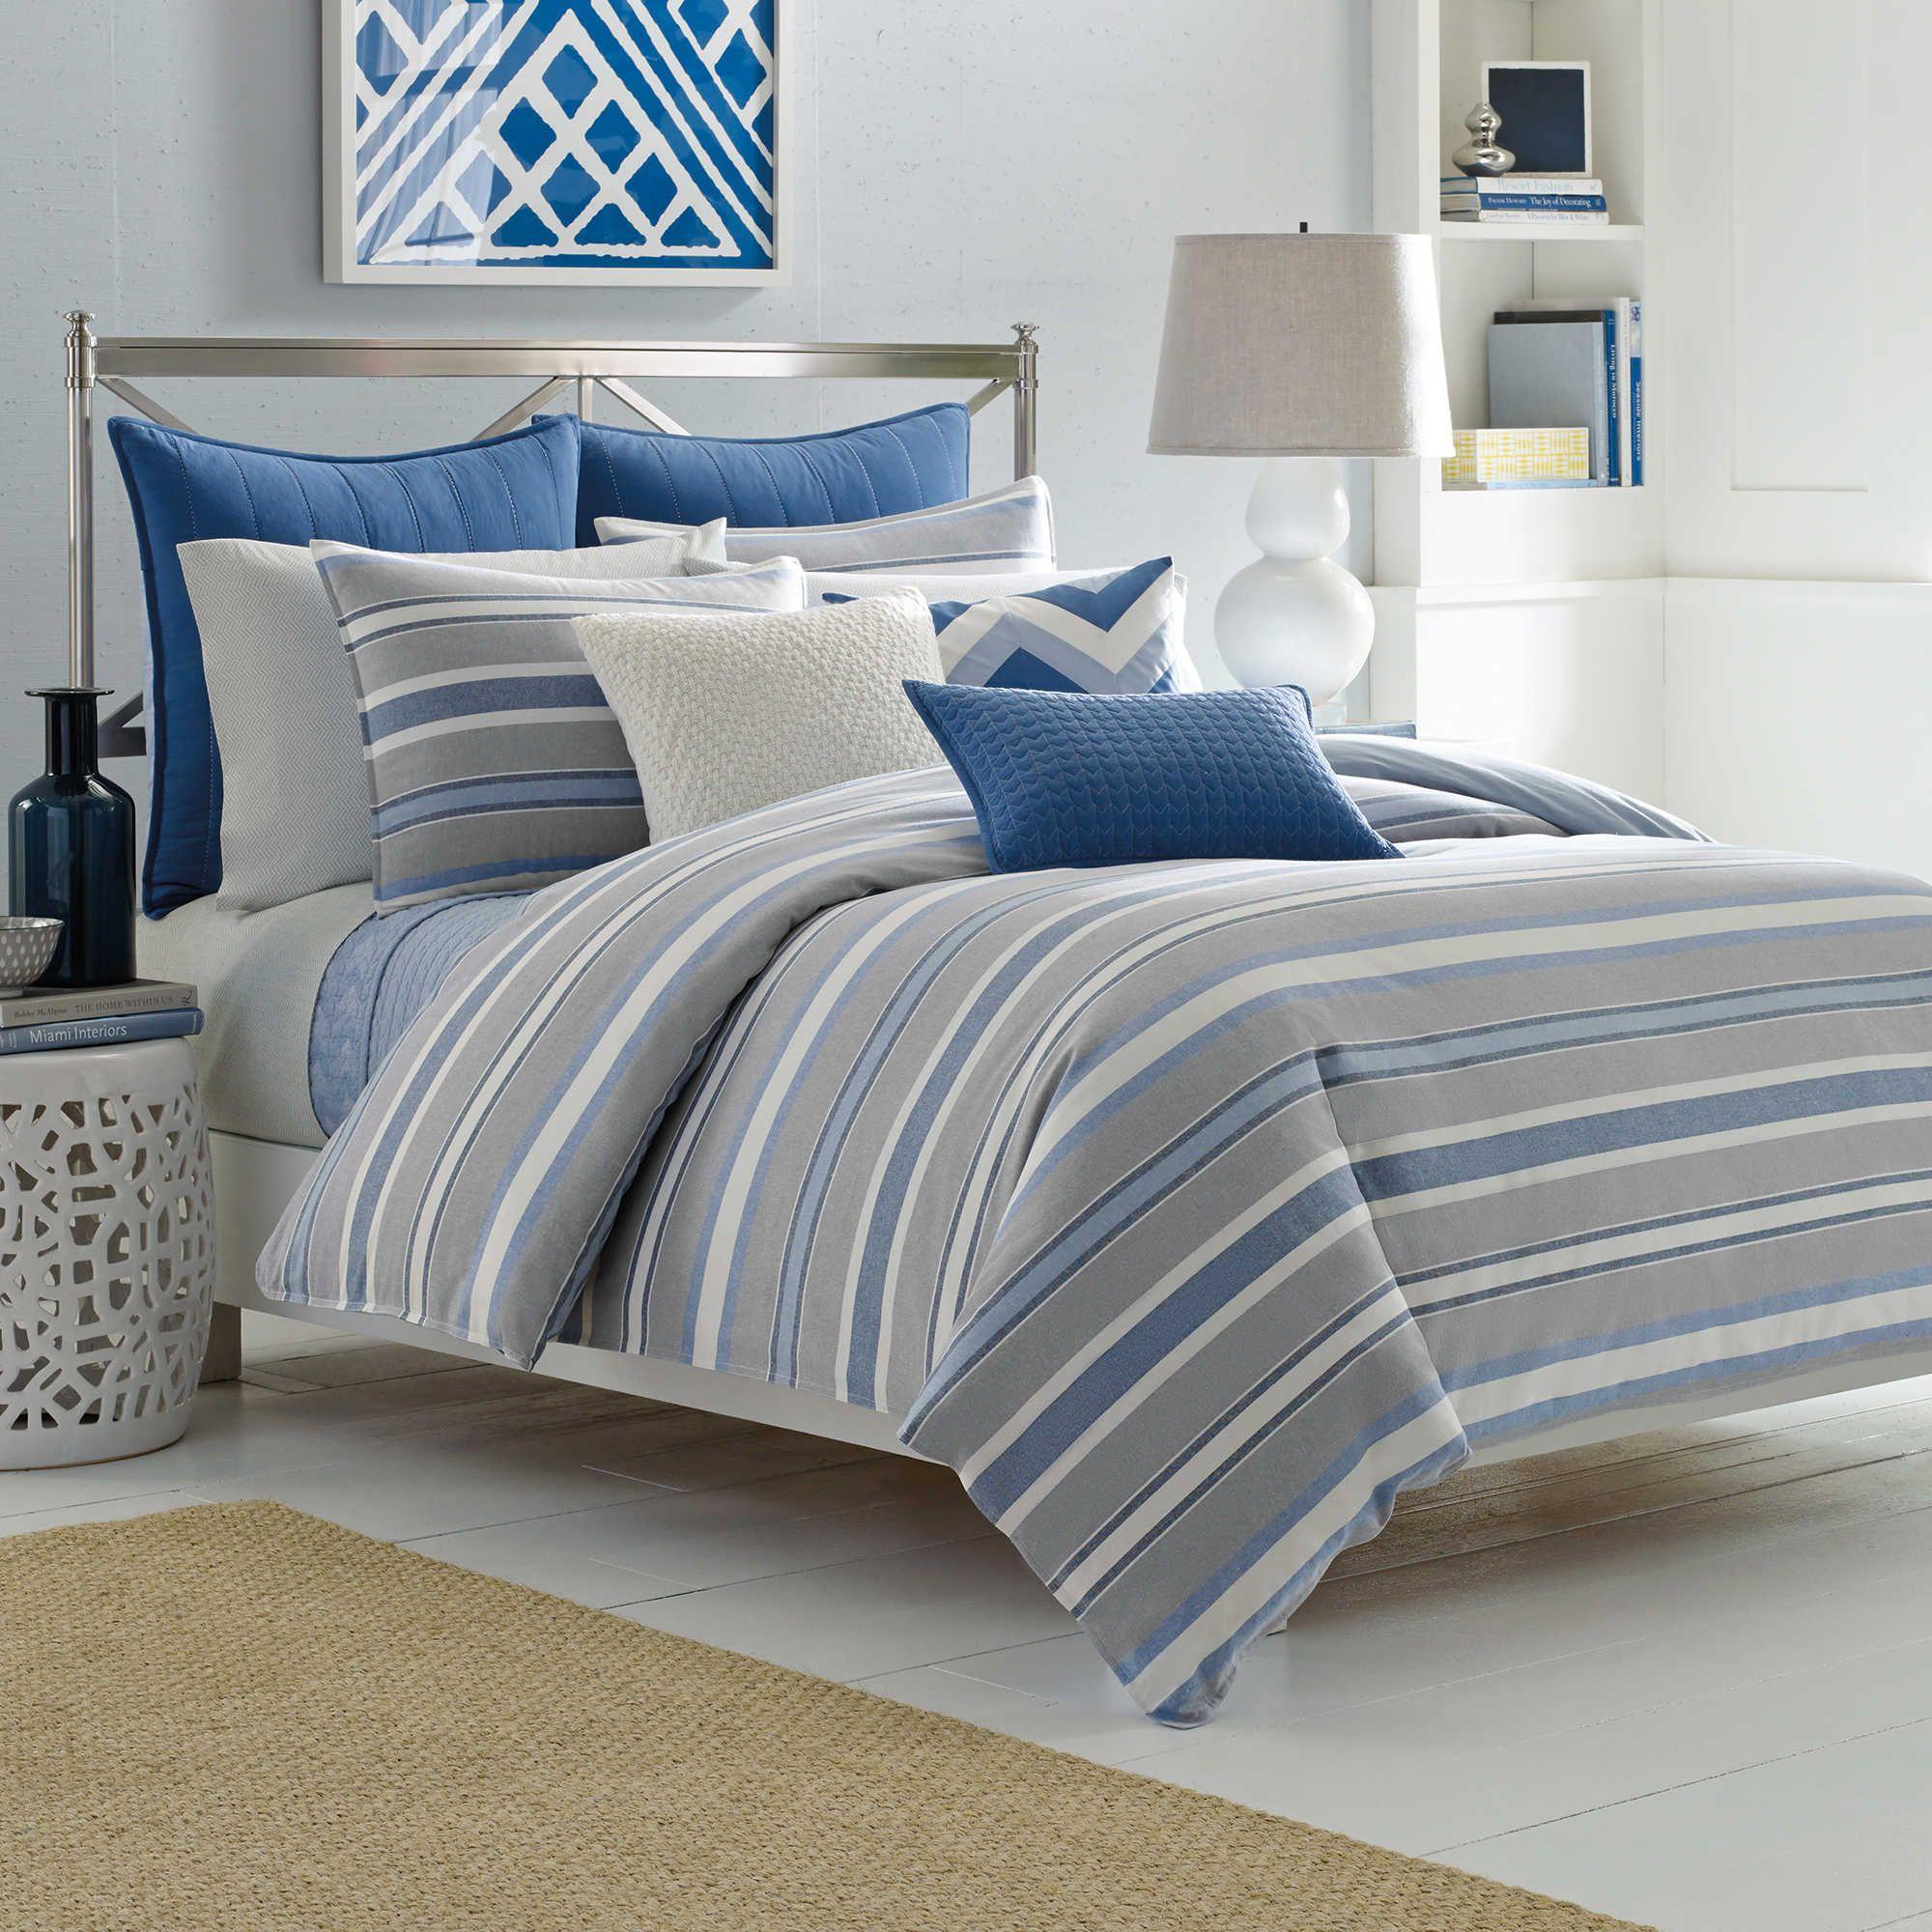 Nautica Sedgemoor Duvet Cover Set In Grey Bedding Sets Comforter Sets Bedding Sets Uk